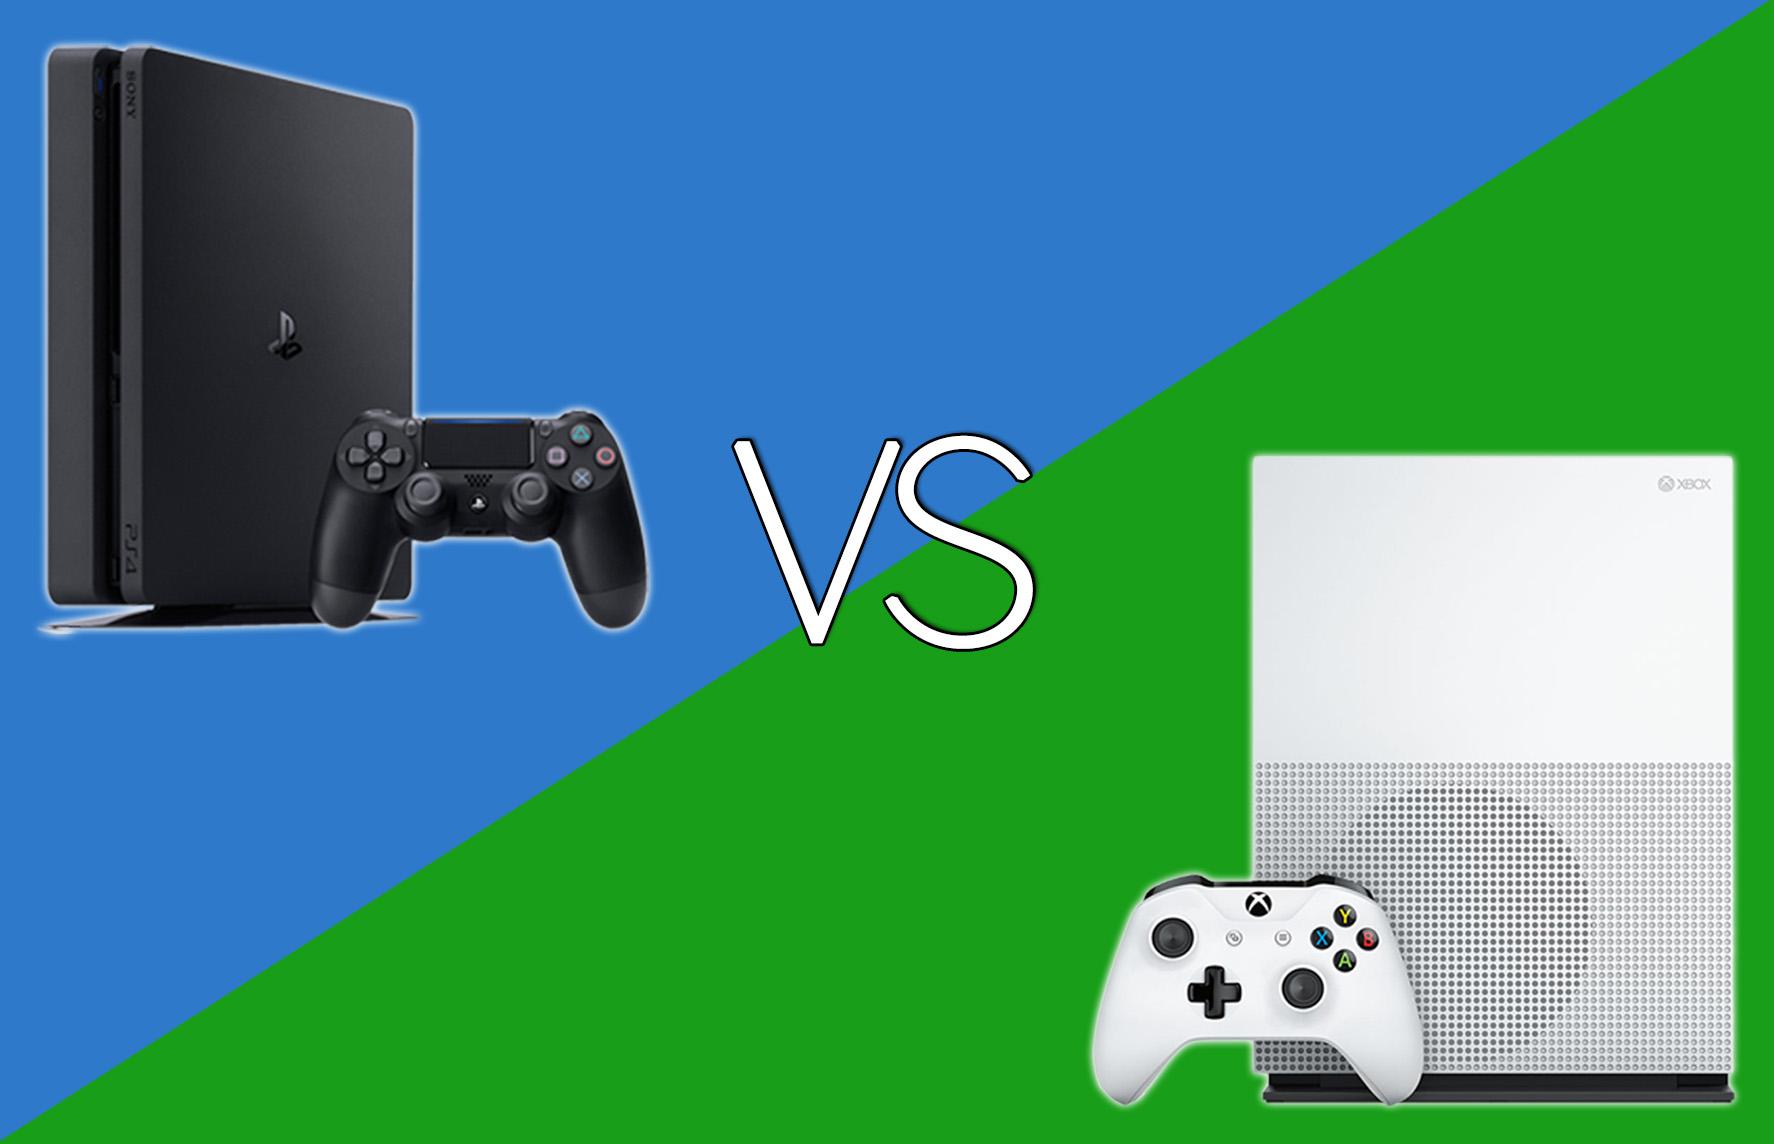 Ps4 vs xbox one quelle console choisir - Quelle console choisir ps ou xbox one ...